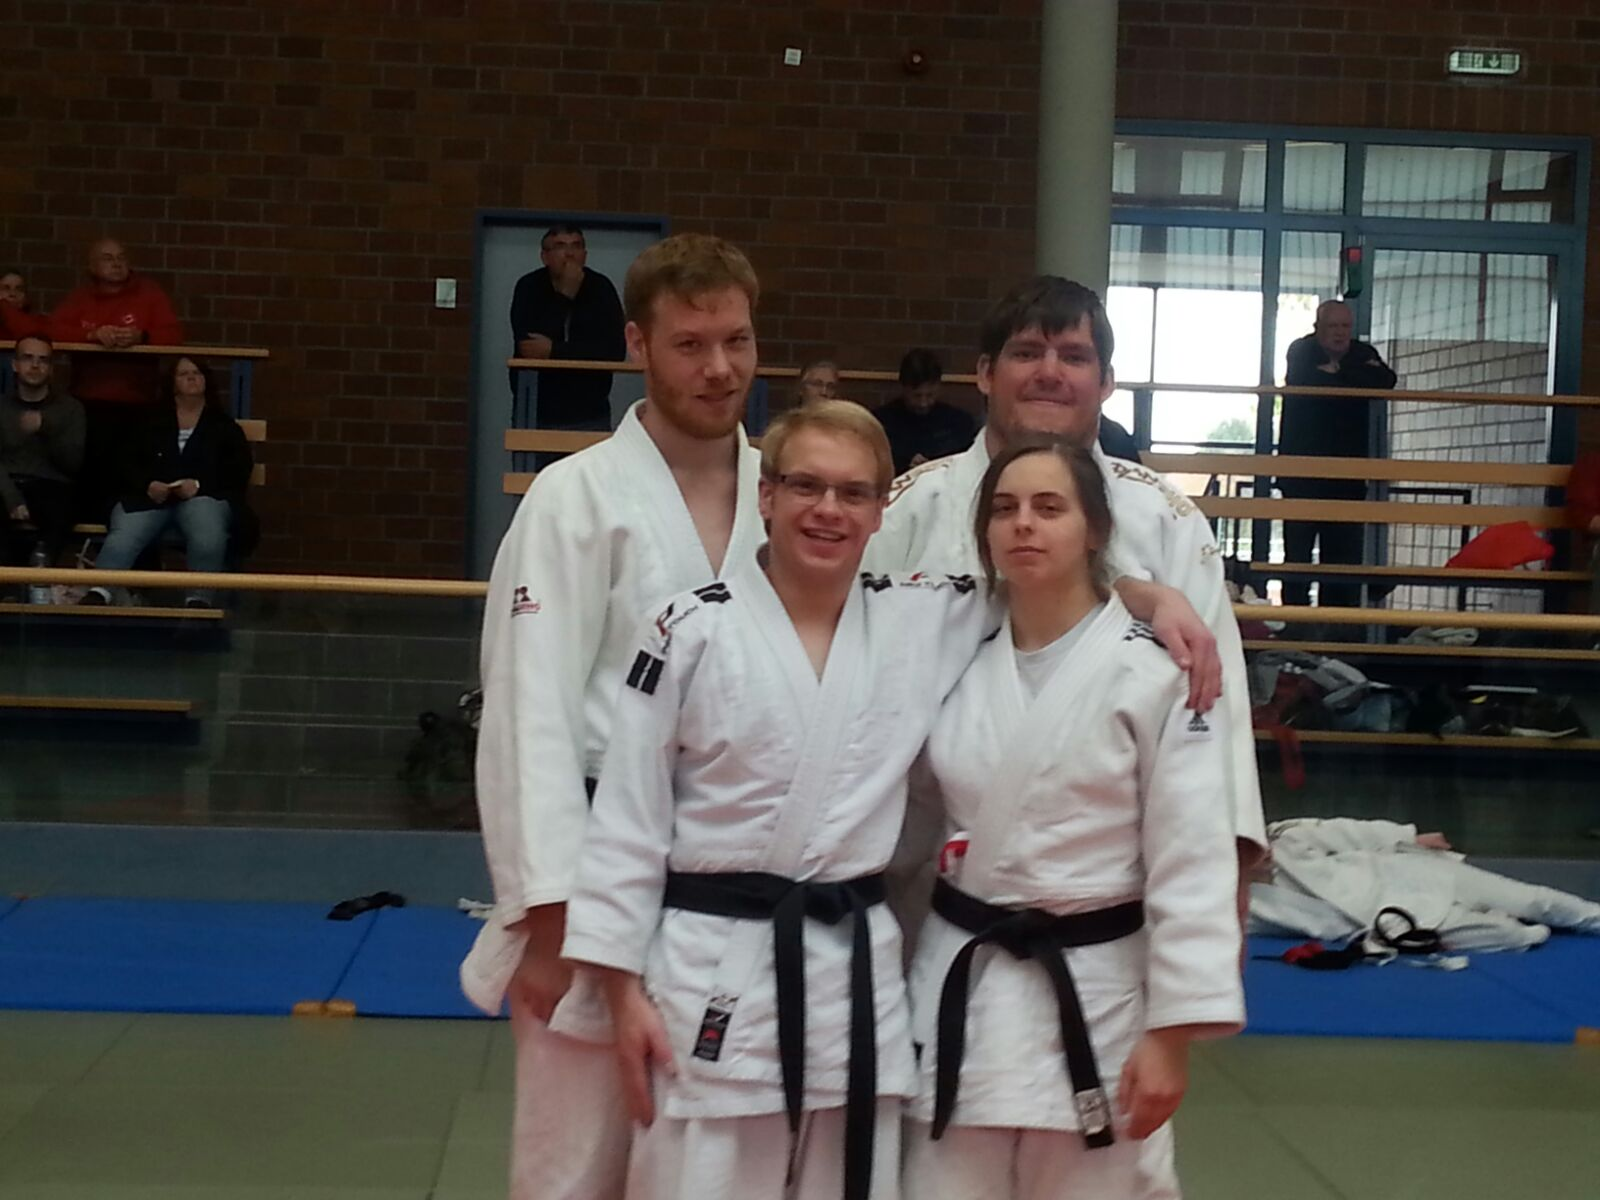 Judoka des JSV Lippstadt waren Erfolgreich bei der Bezirksmeisterschaft Arnsberg!